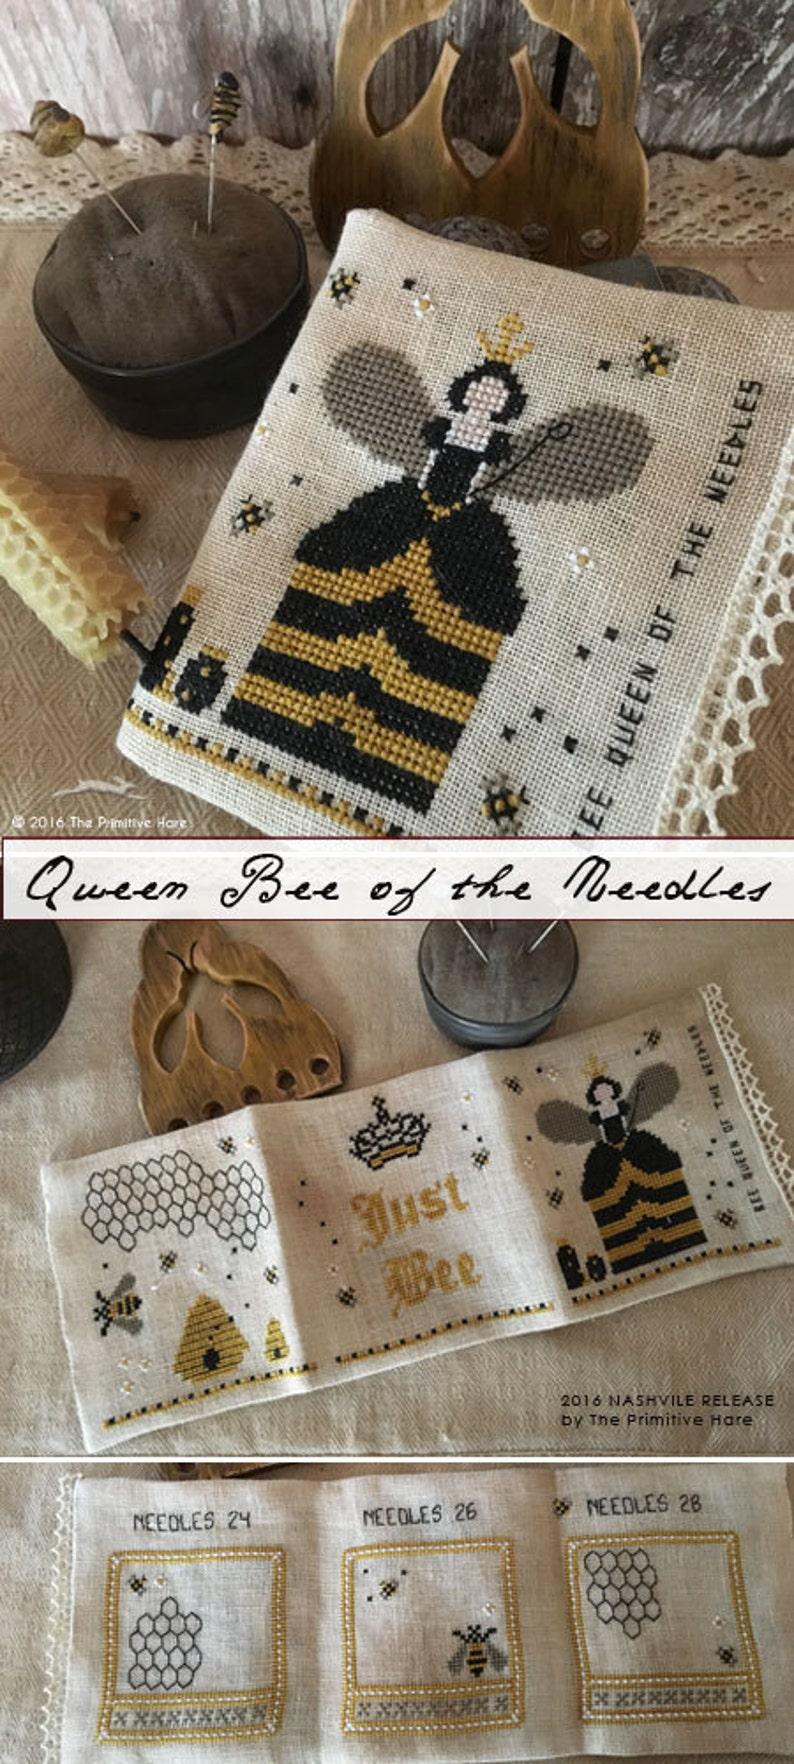 Bee Queen of the Needles PDF image 1